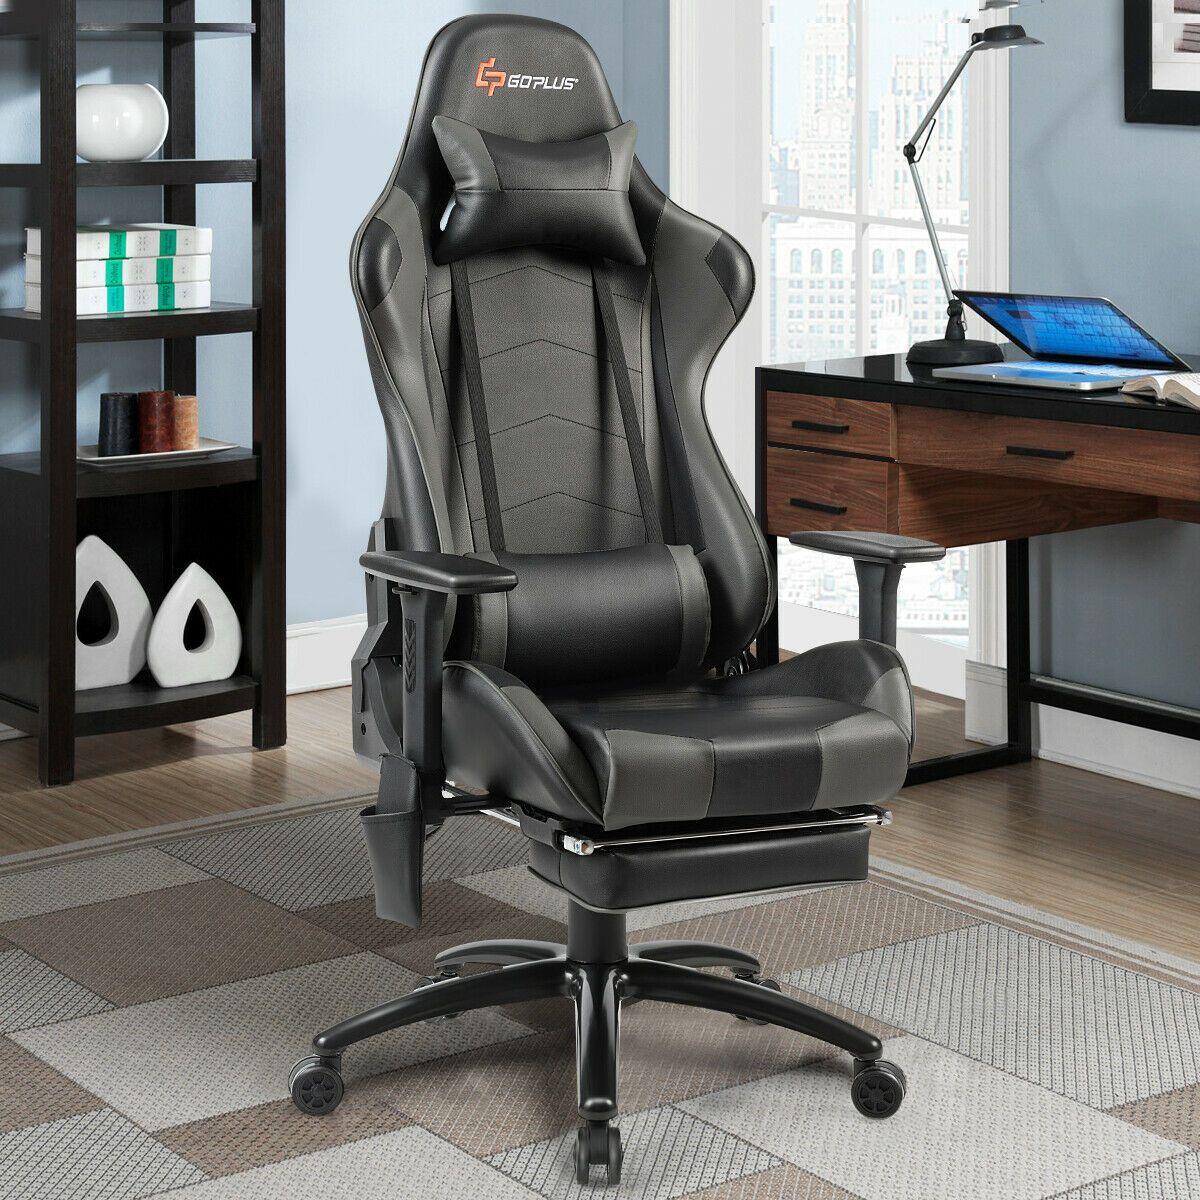 Ergonomic high back pu leather massage gaming chairgray